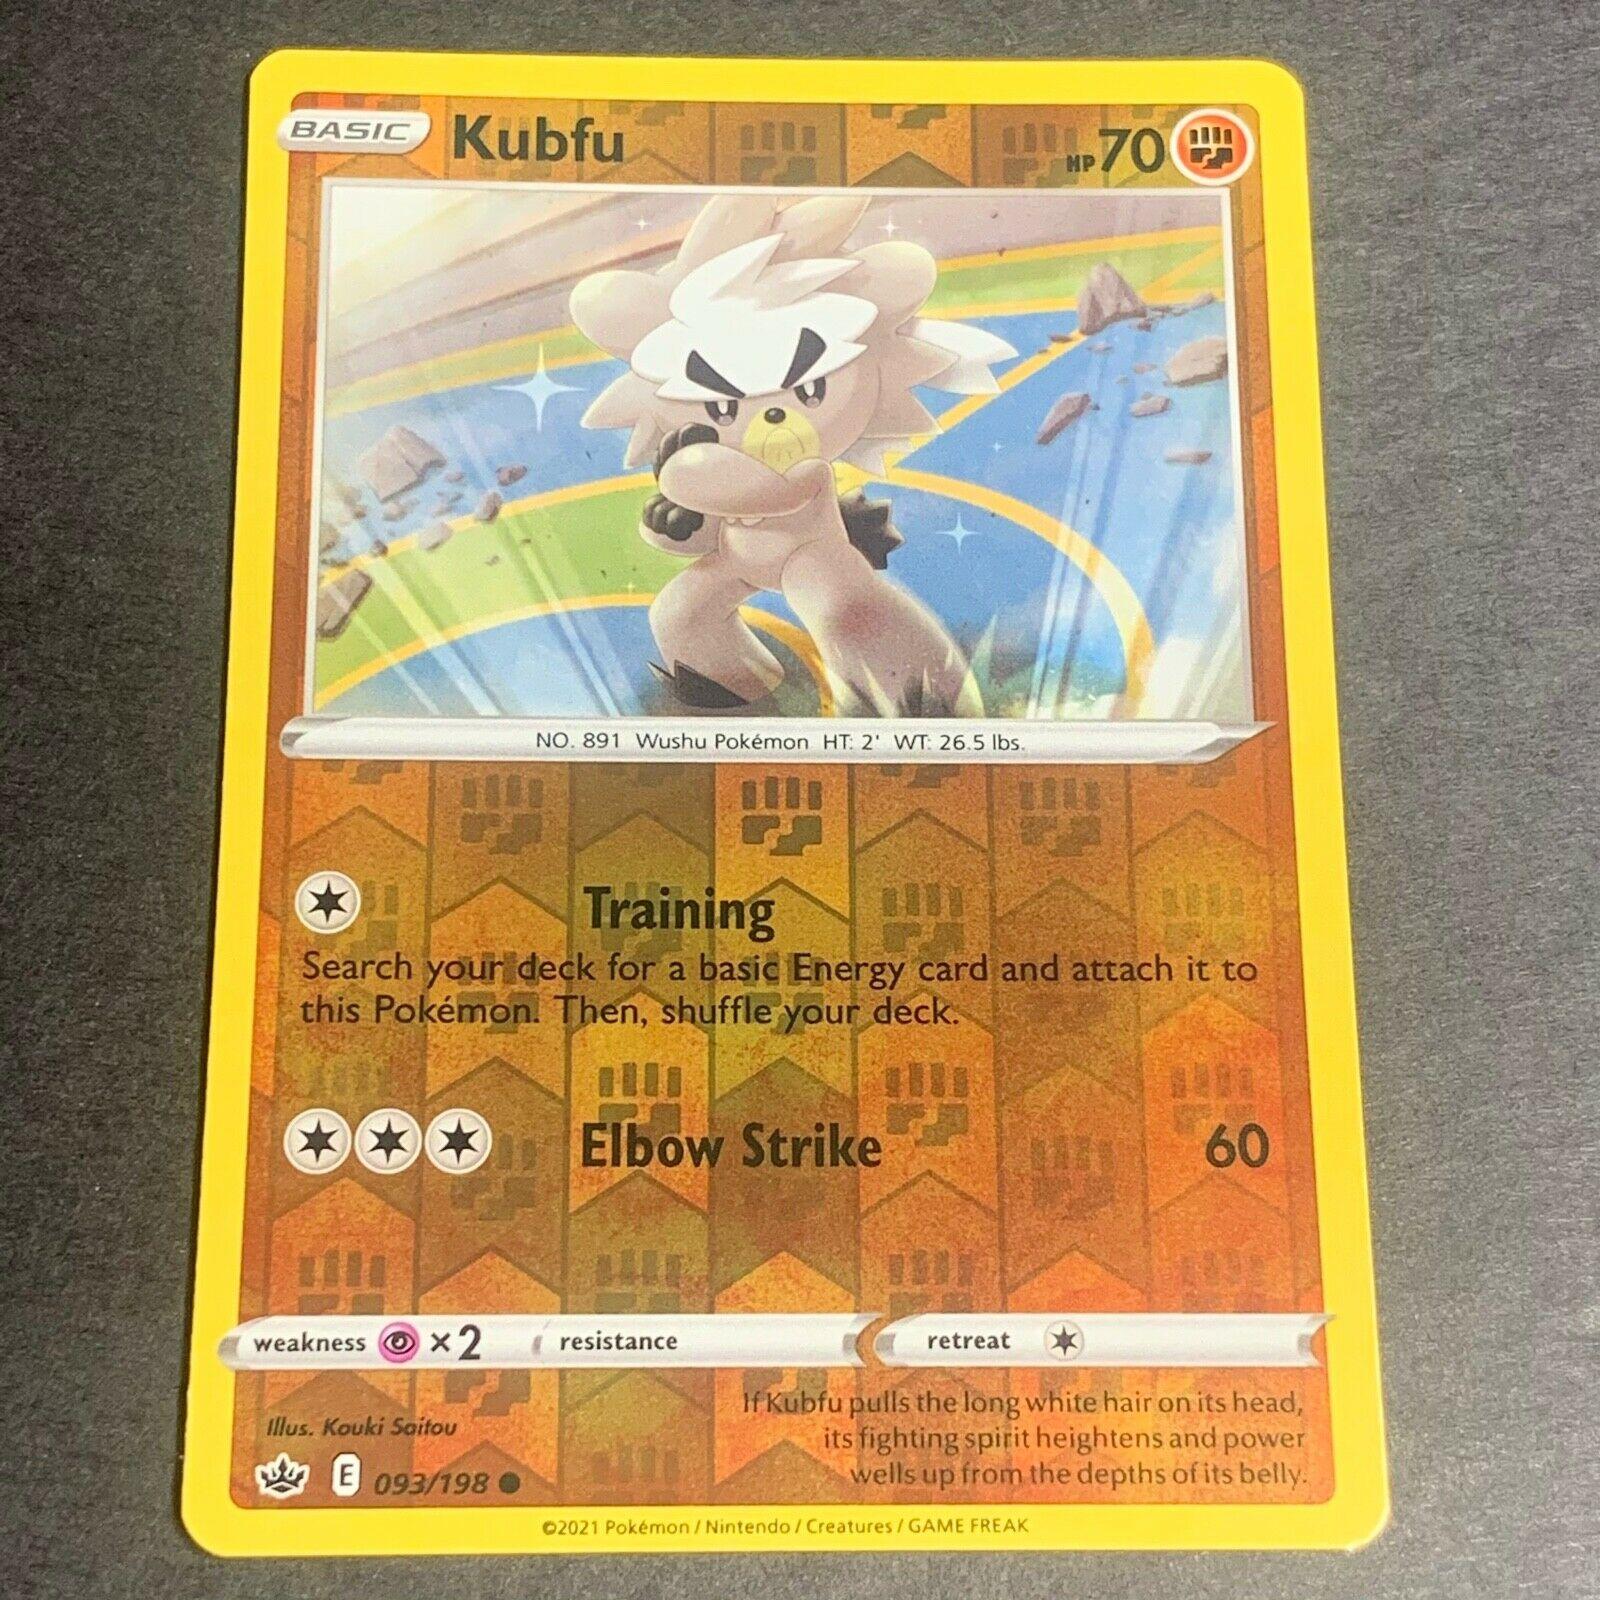 Pokemon S&S Chilling Reign Set REVERSE HOLO (C.) Kubfu 093/198 - Near Mint (NM)